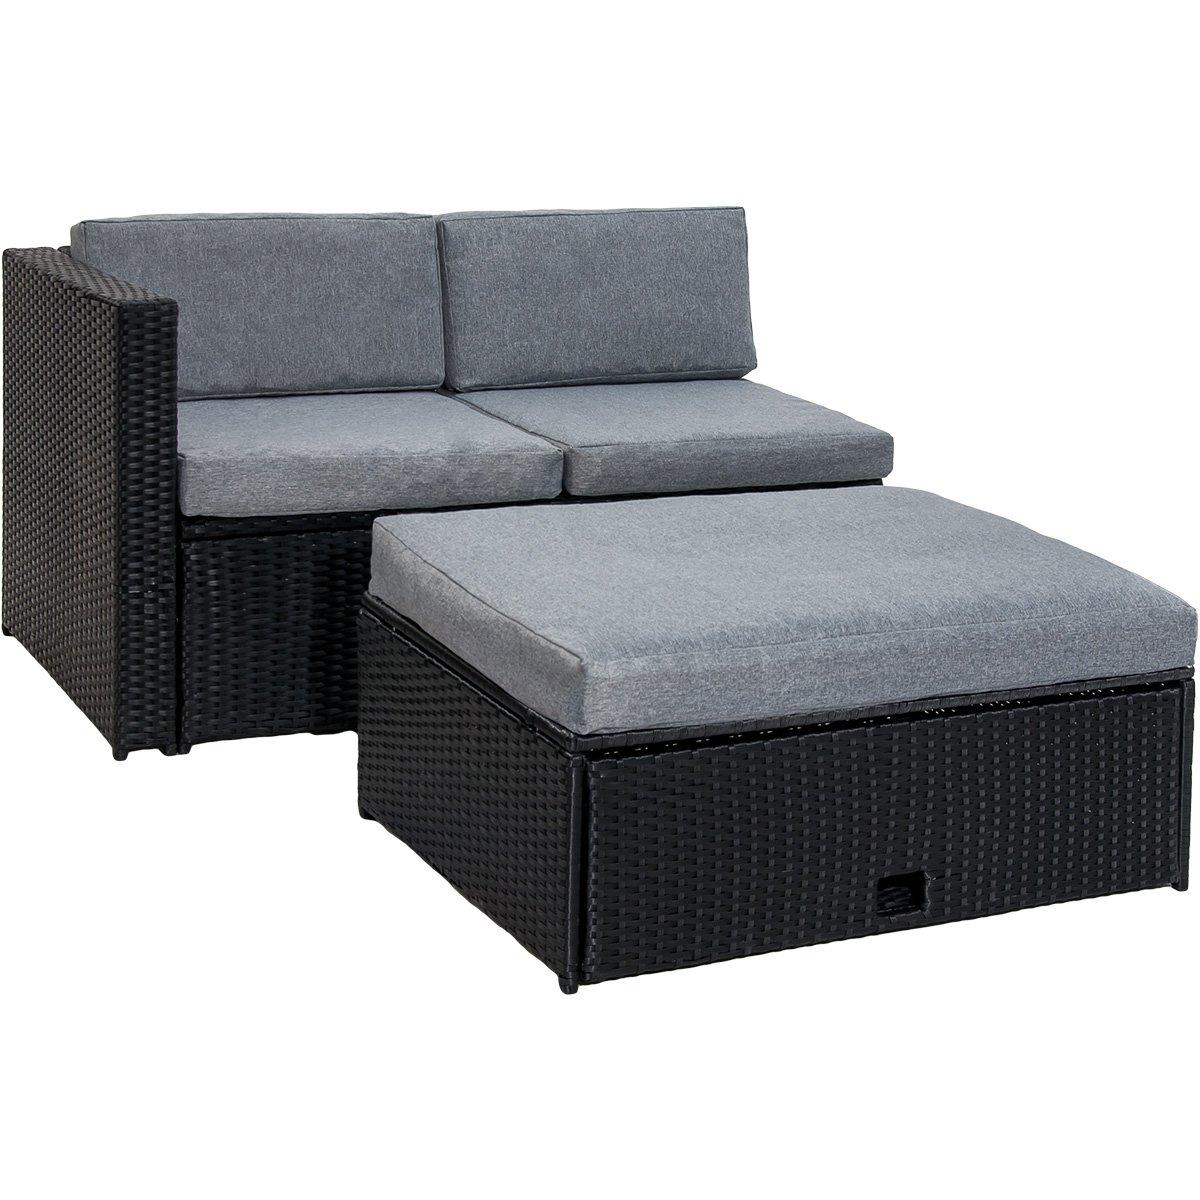 Amazon.com : Merax 4 Piece Cushioned Outdoor Patio PE Rattan ...